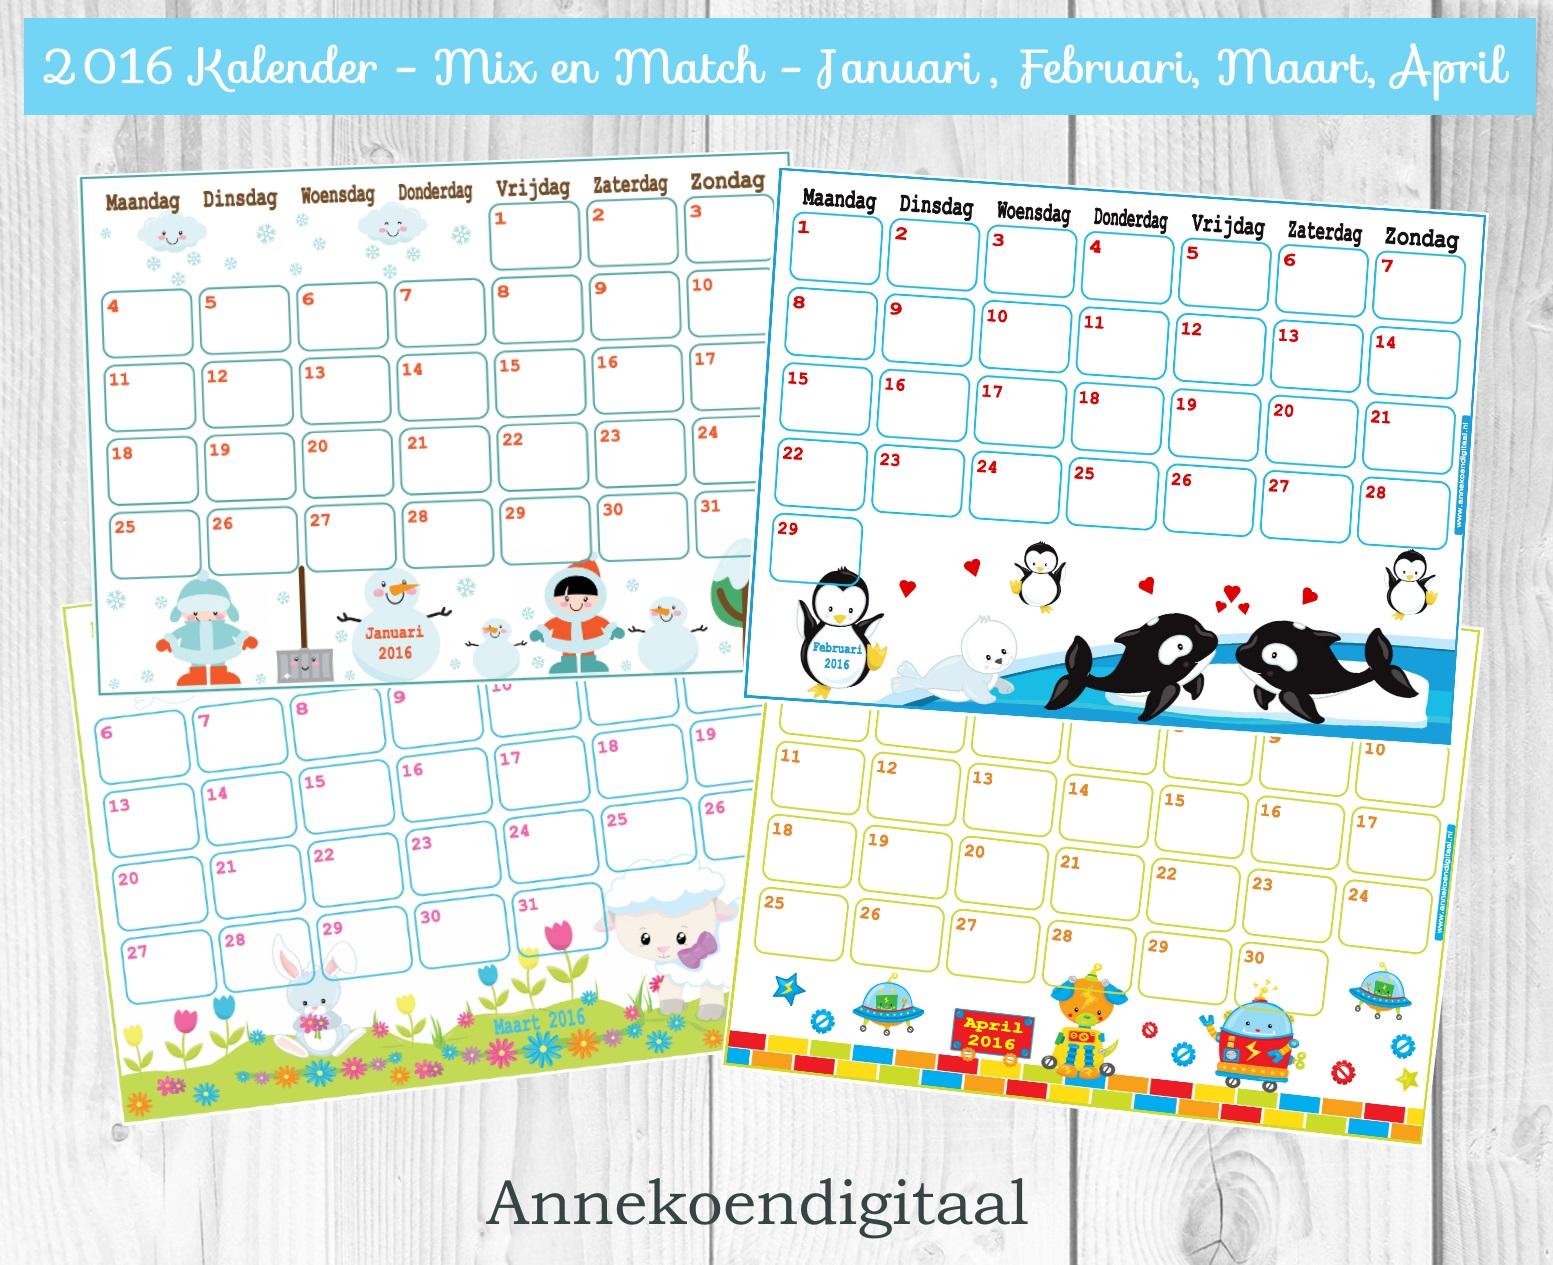 Pingu 239 n kalender 2016 kalender kalender printable 2016 tuxx 2016